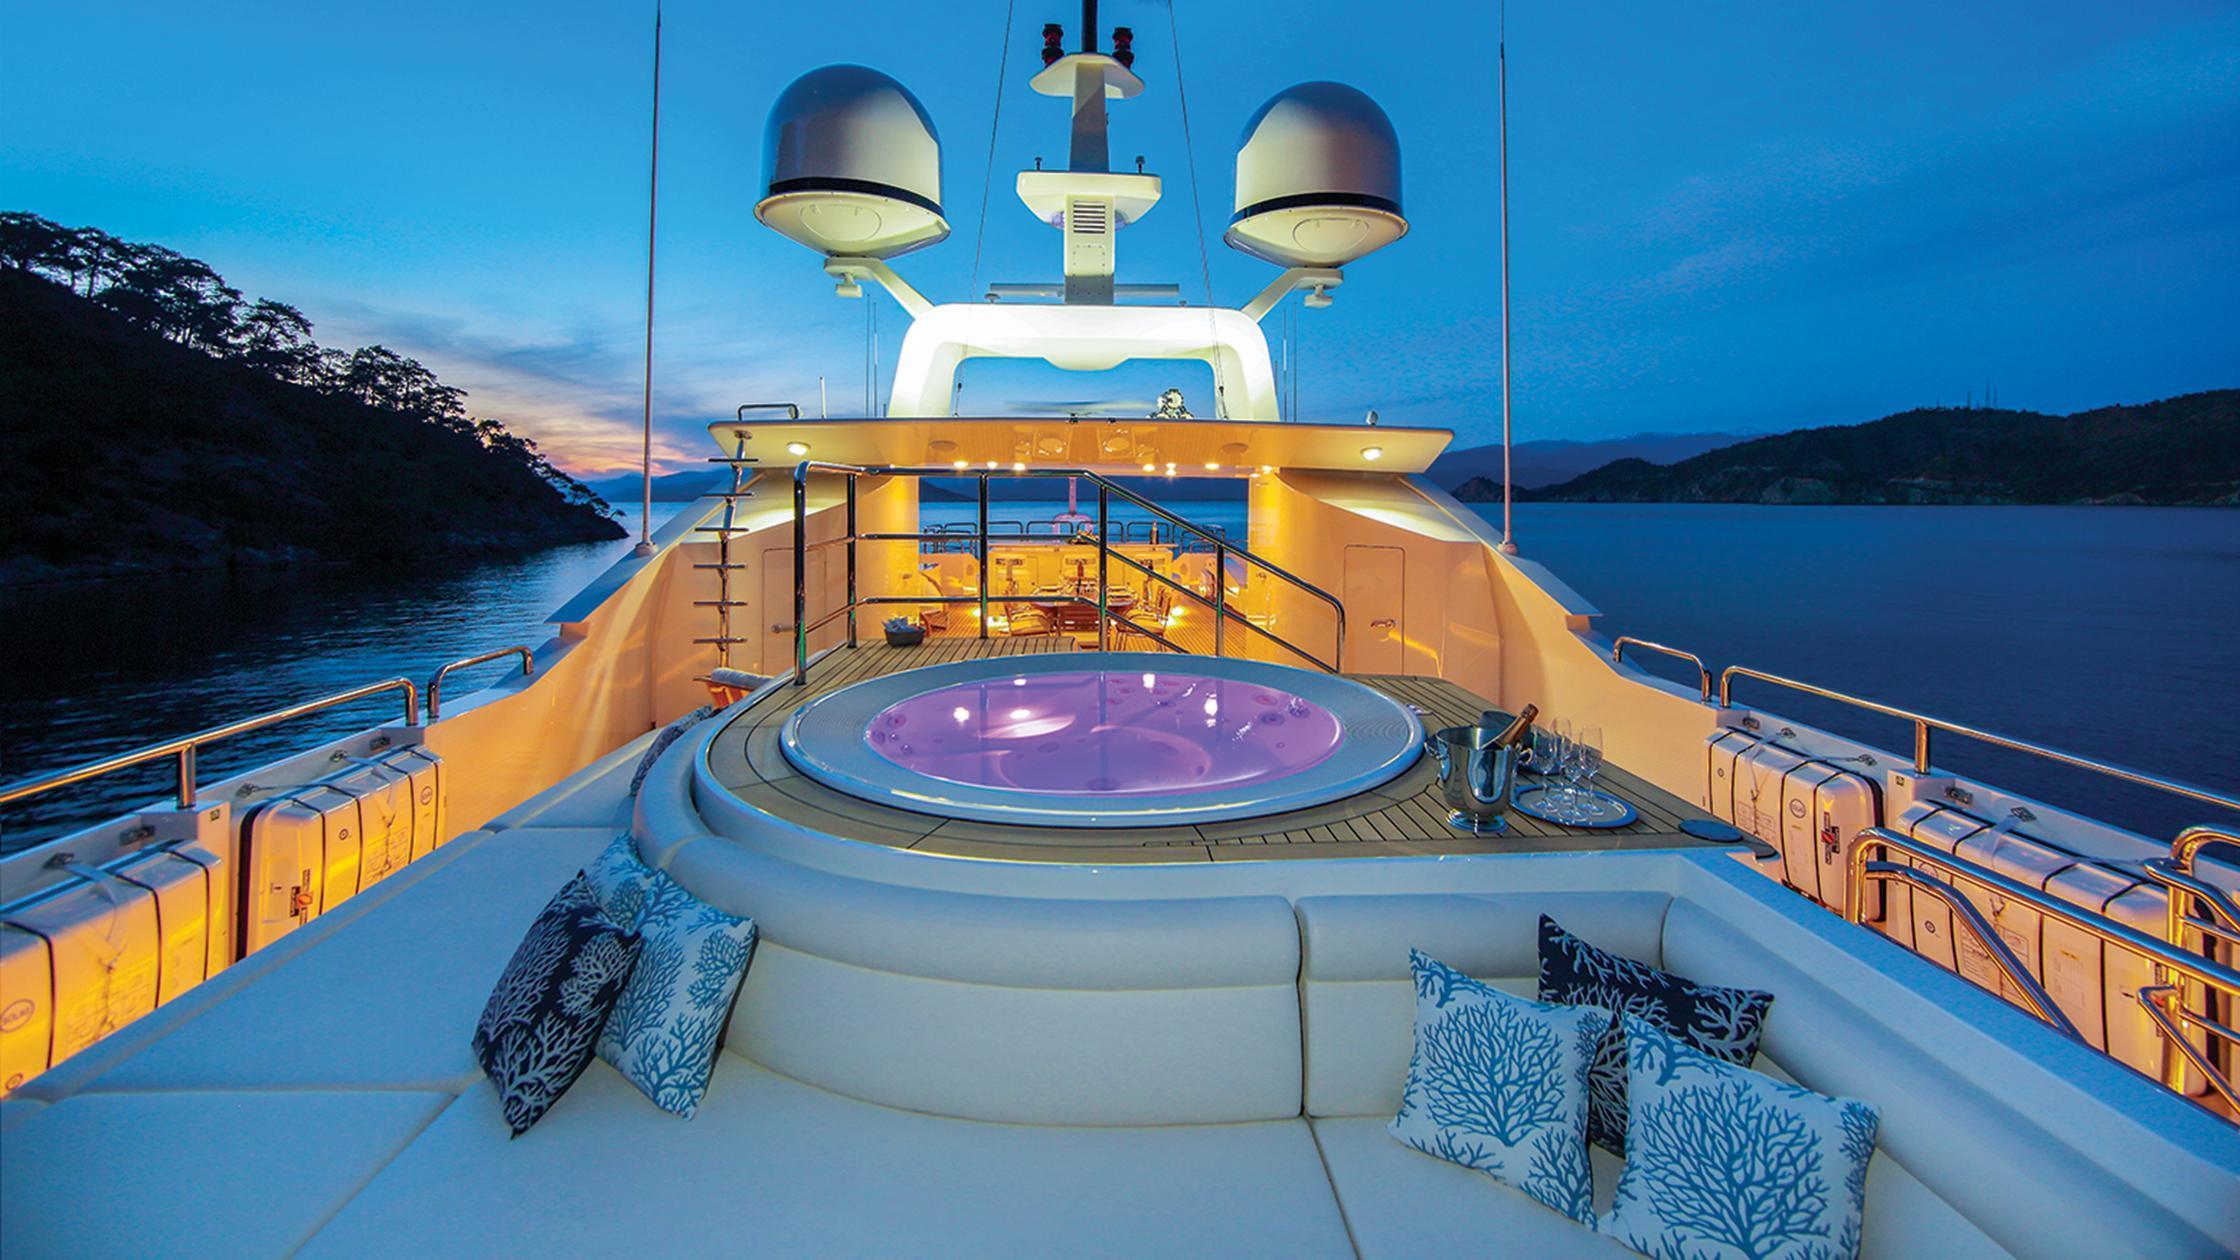 vica-motor-yacht-benetti-2015-50m-jacuzzi-night